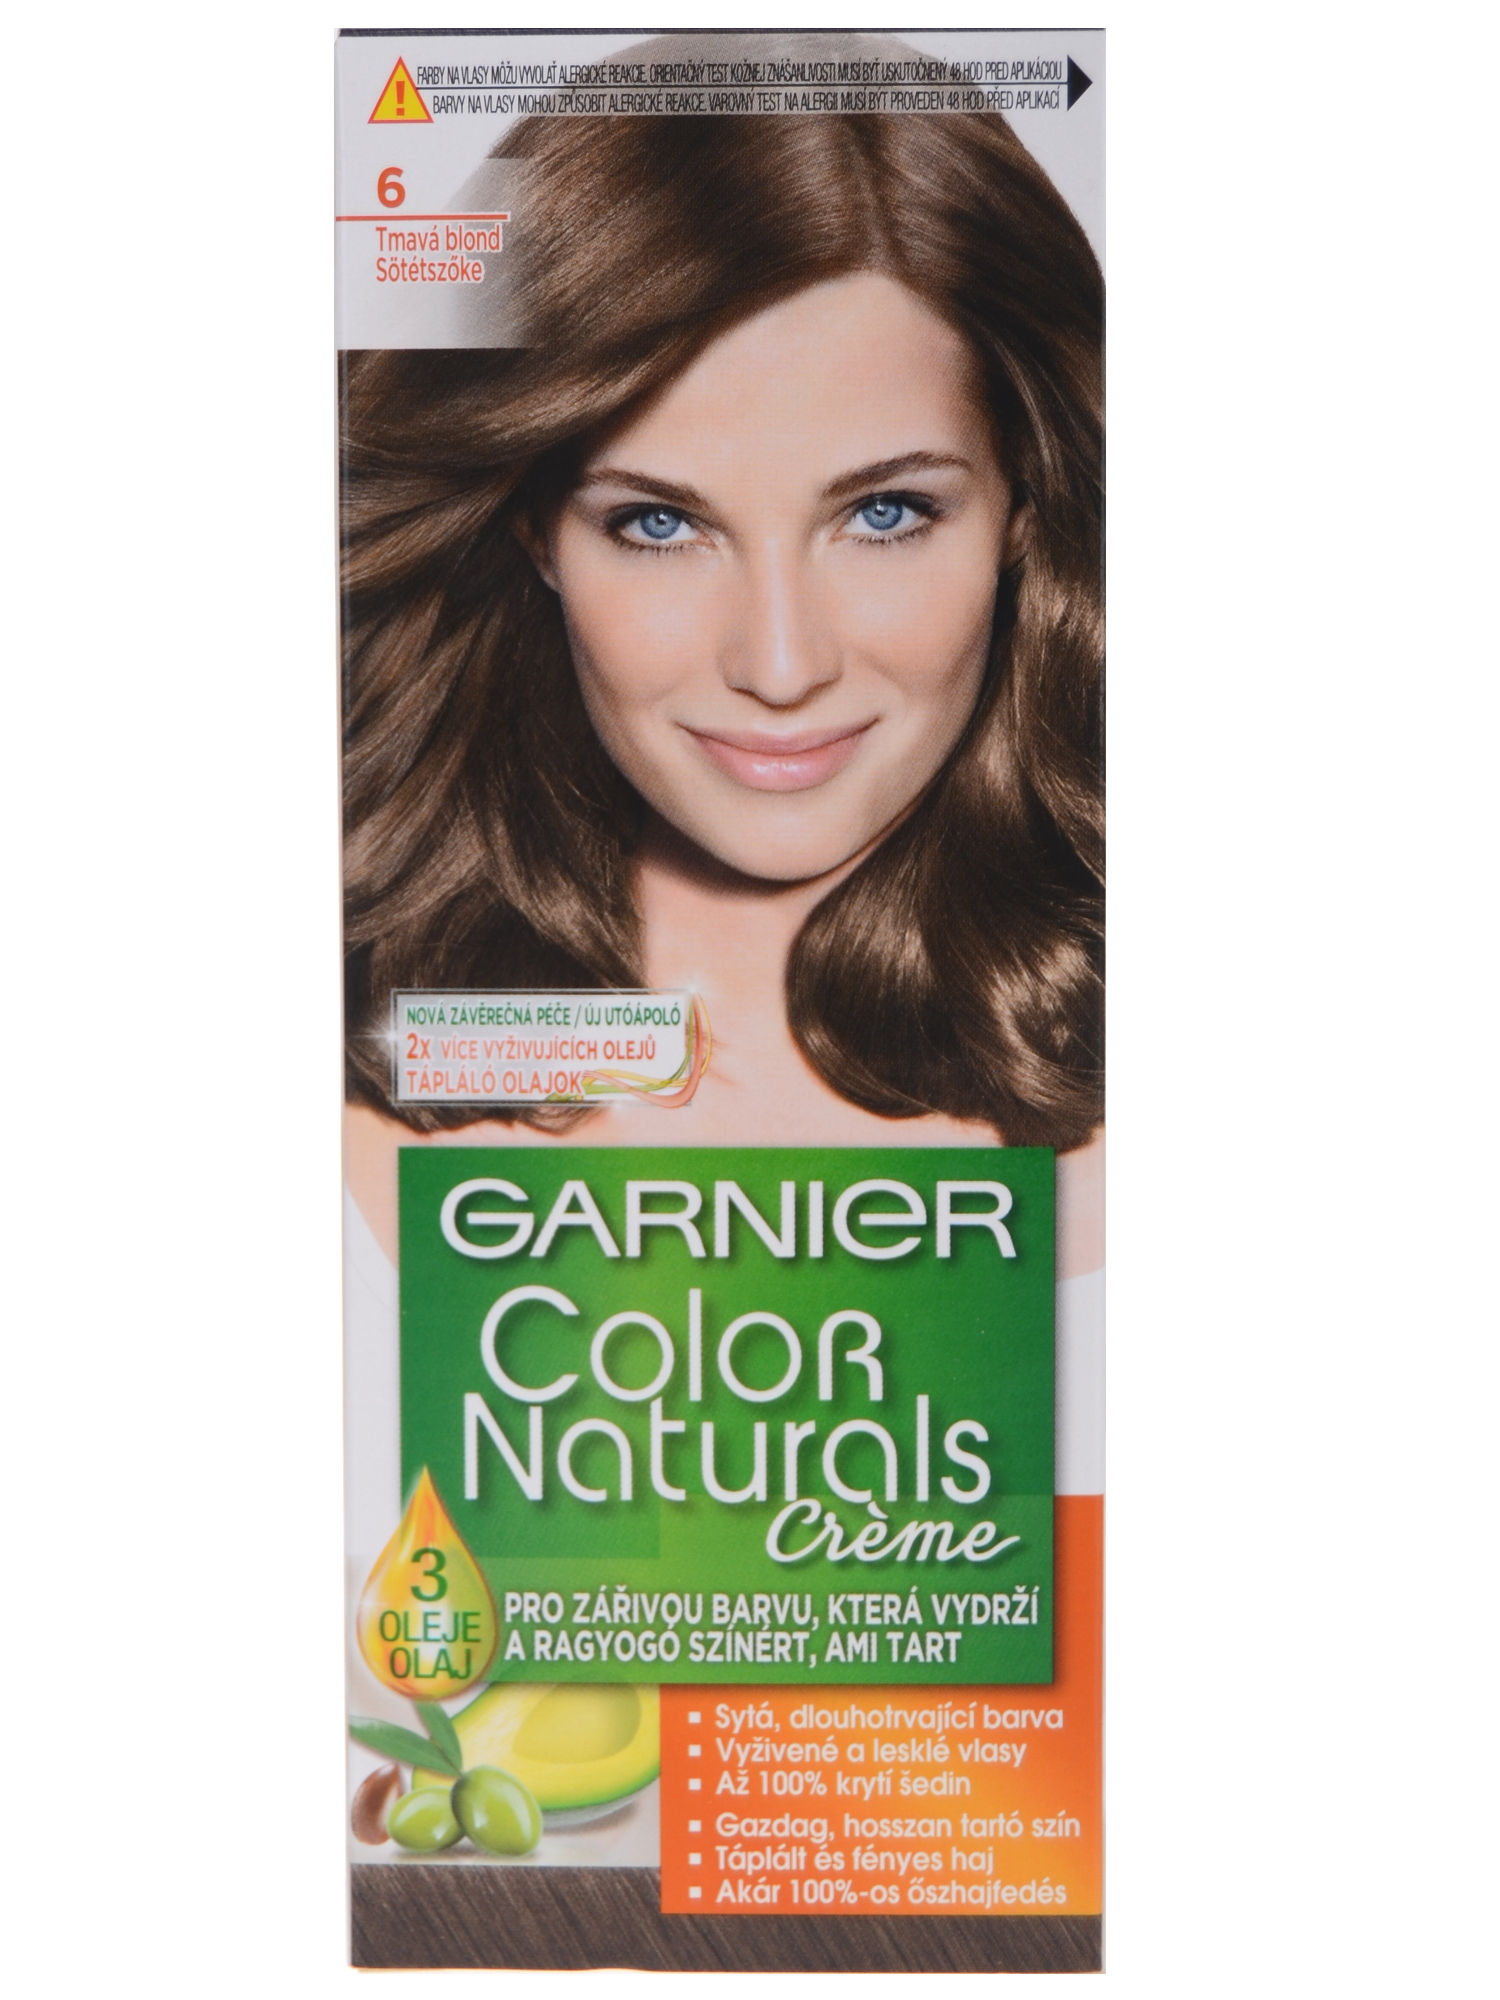 Permanentní barva Garnier Color Naturals 6 tmavá blond f243ca1ab49